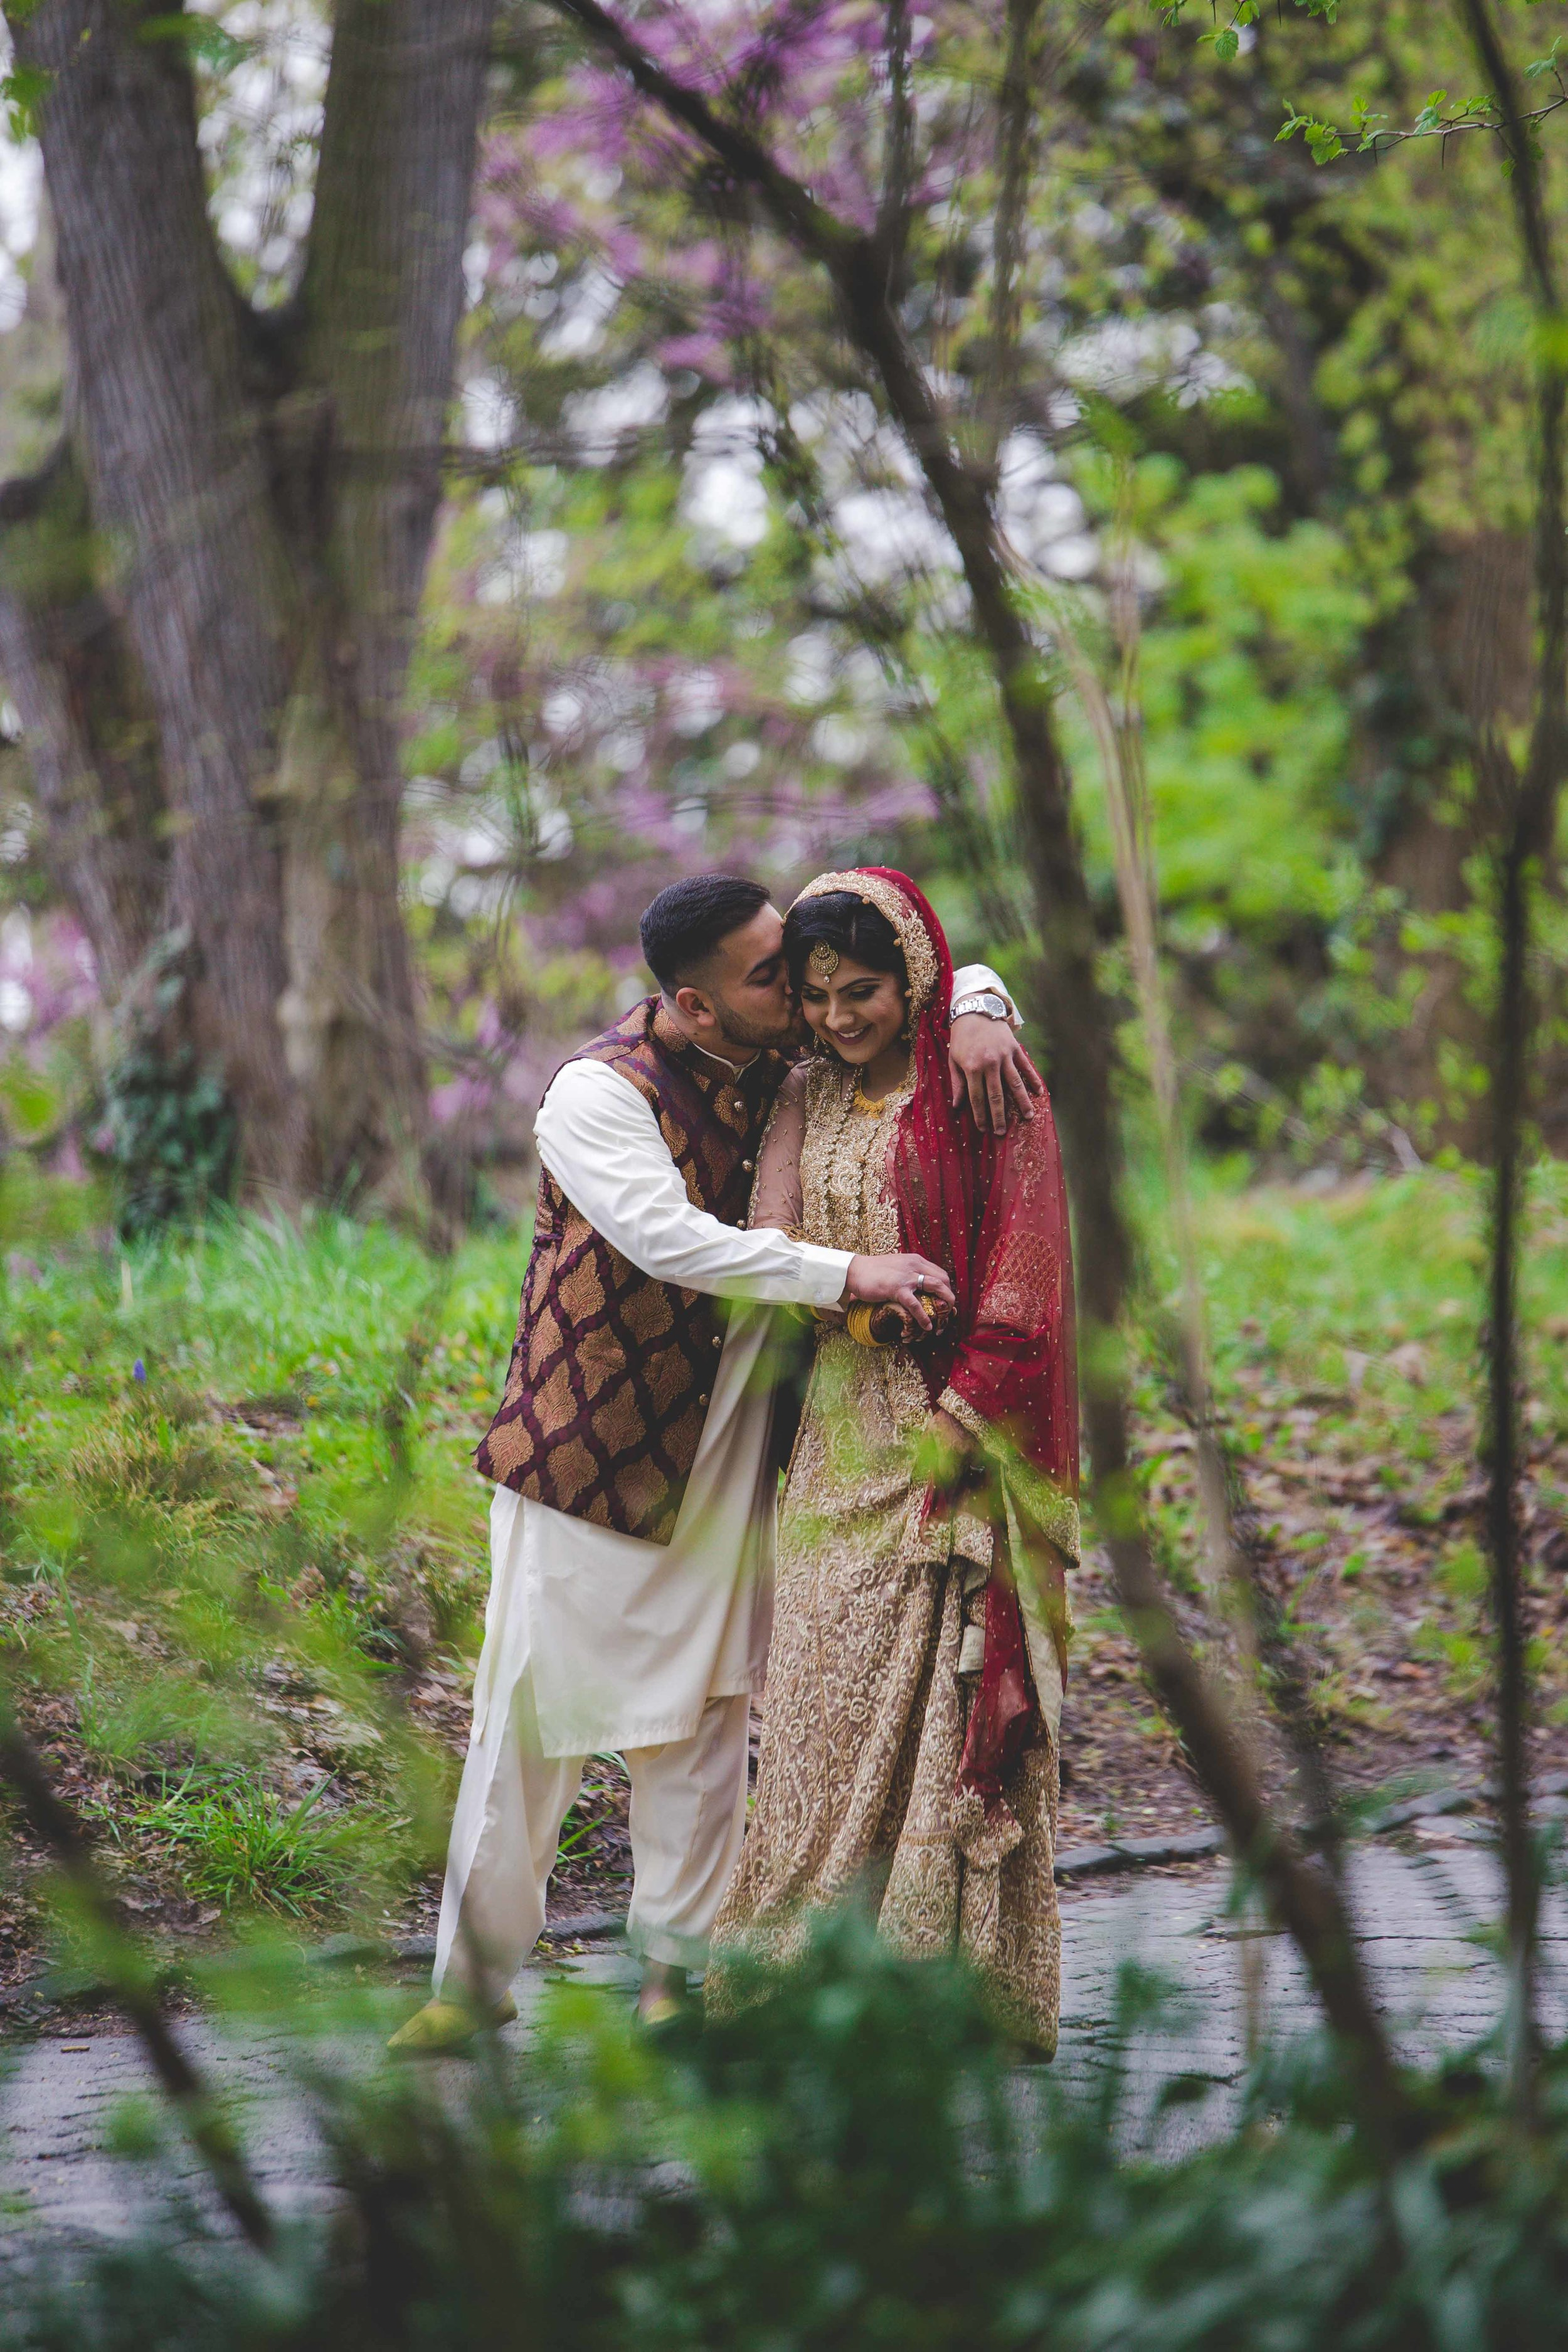 pakistani-wedding-photographer-brooklyn-new-york-33.jpg